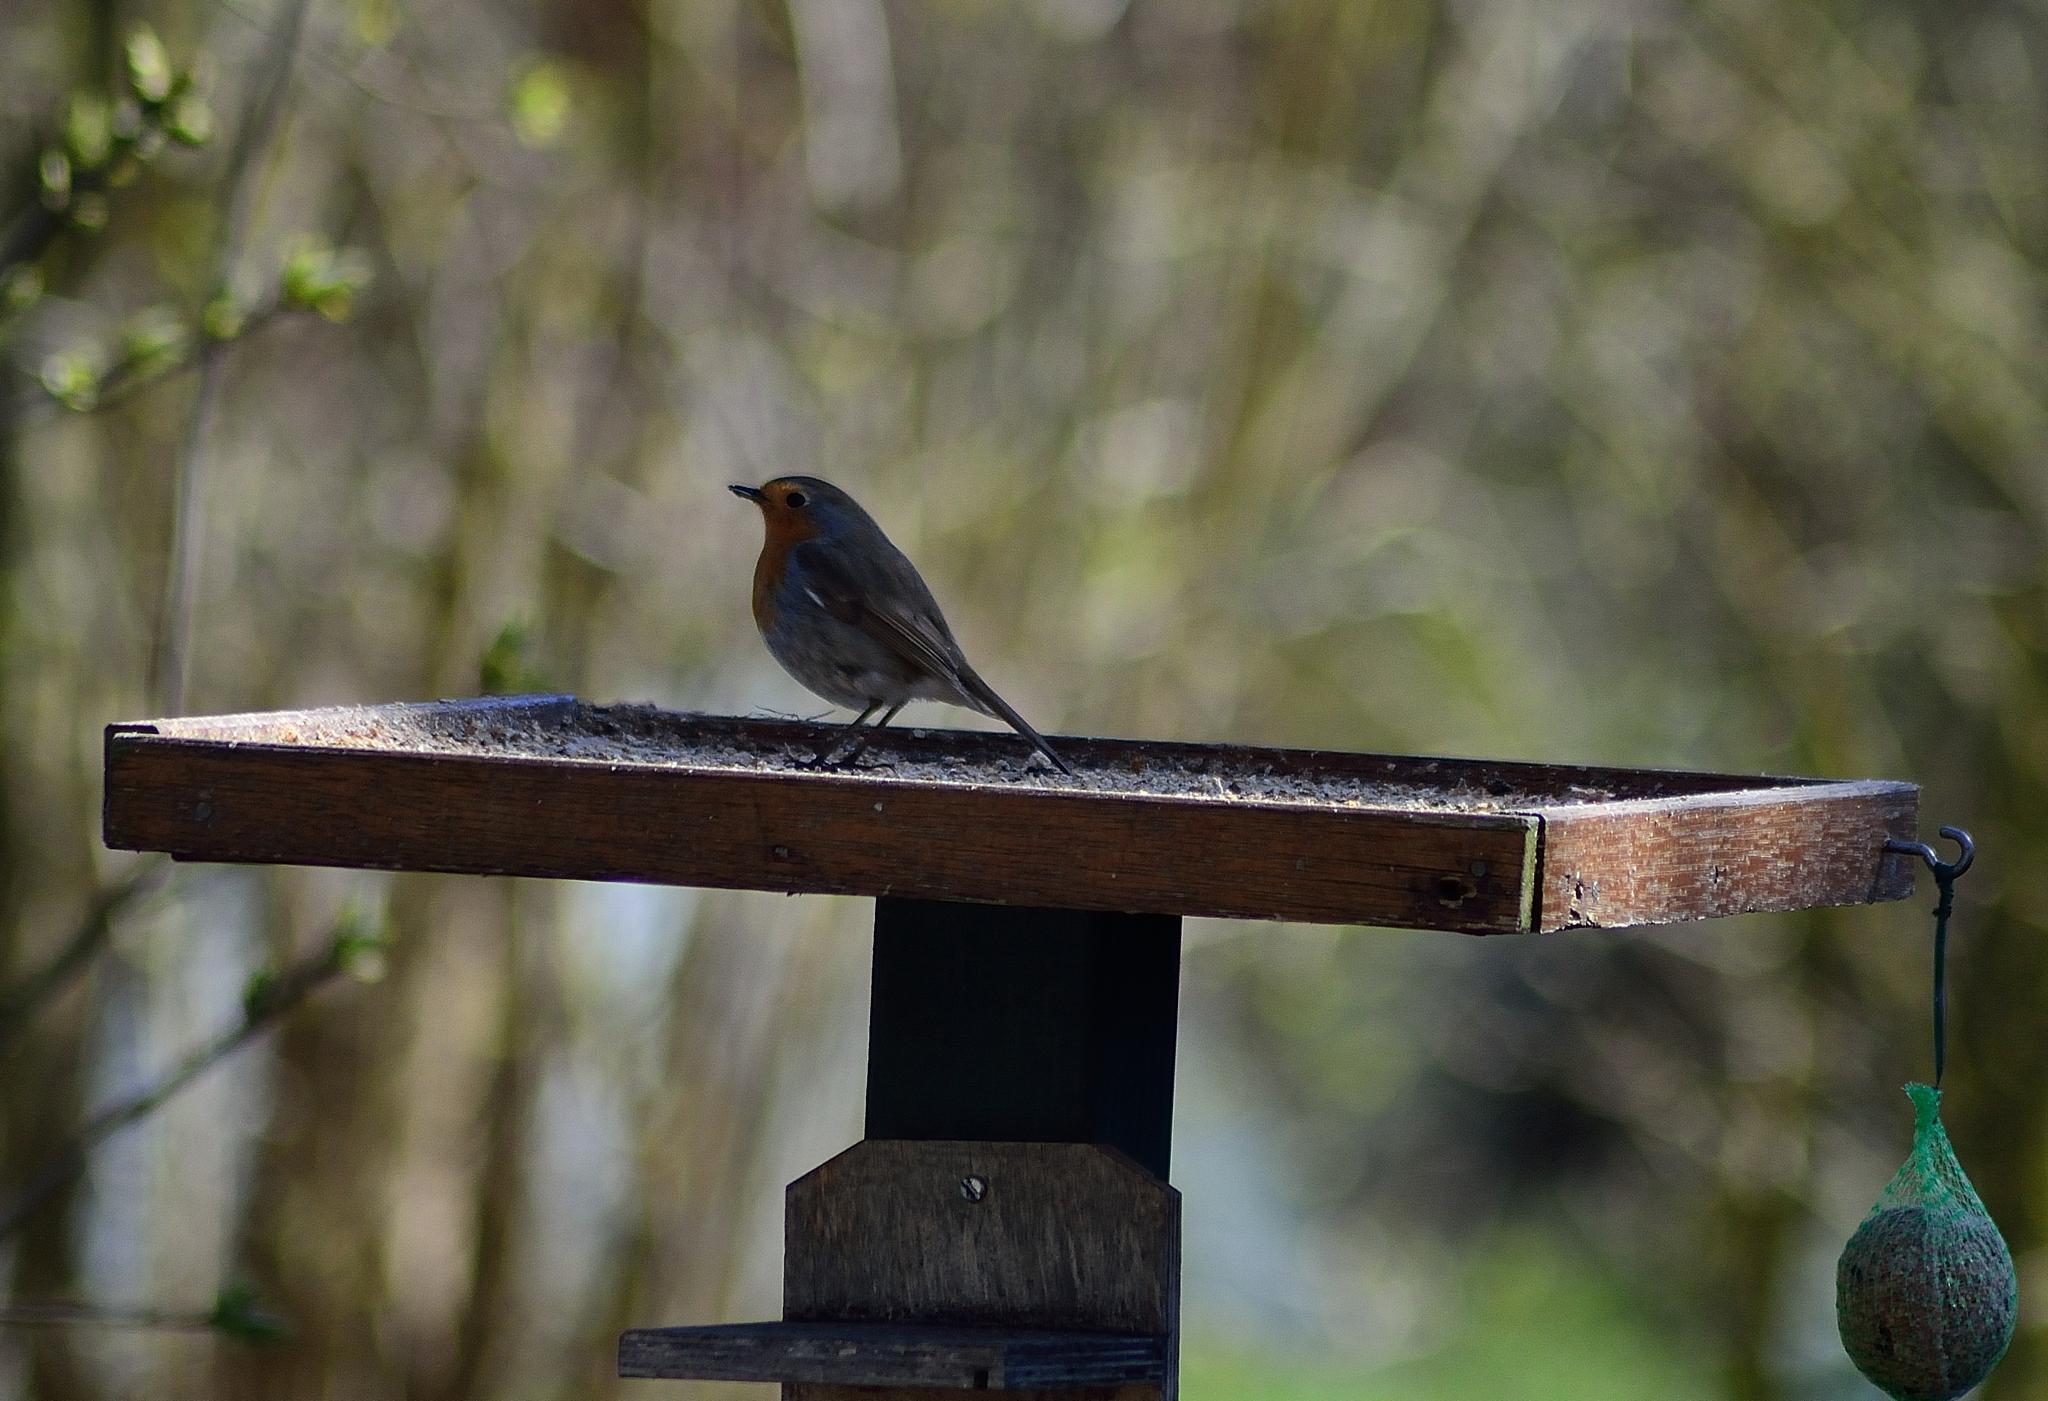 Roodborstje / European Robin (Erithacus rubecula) by bartsmid